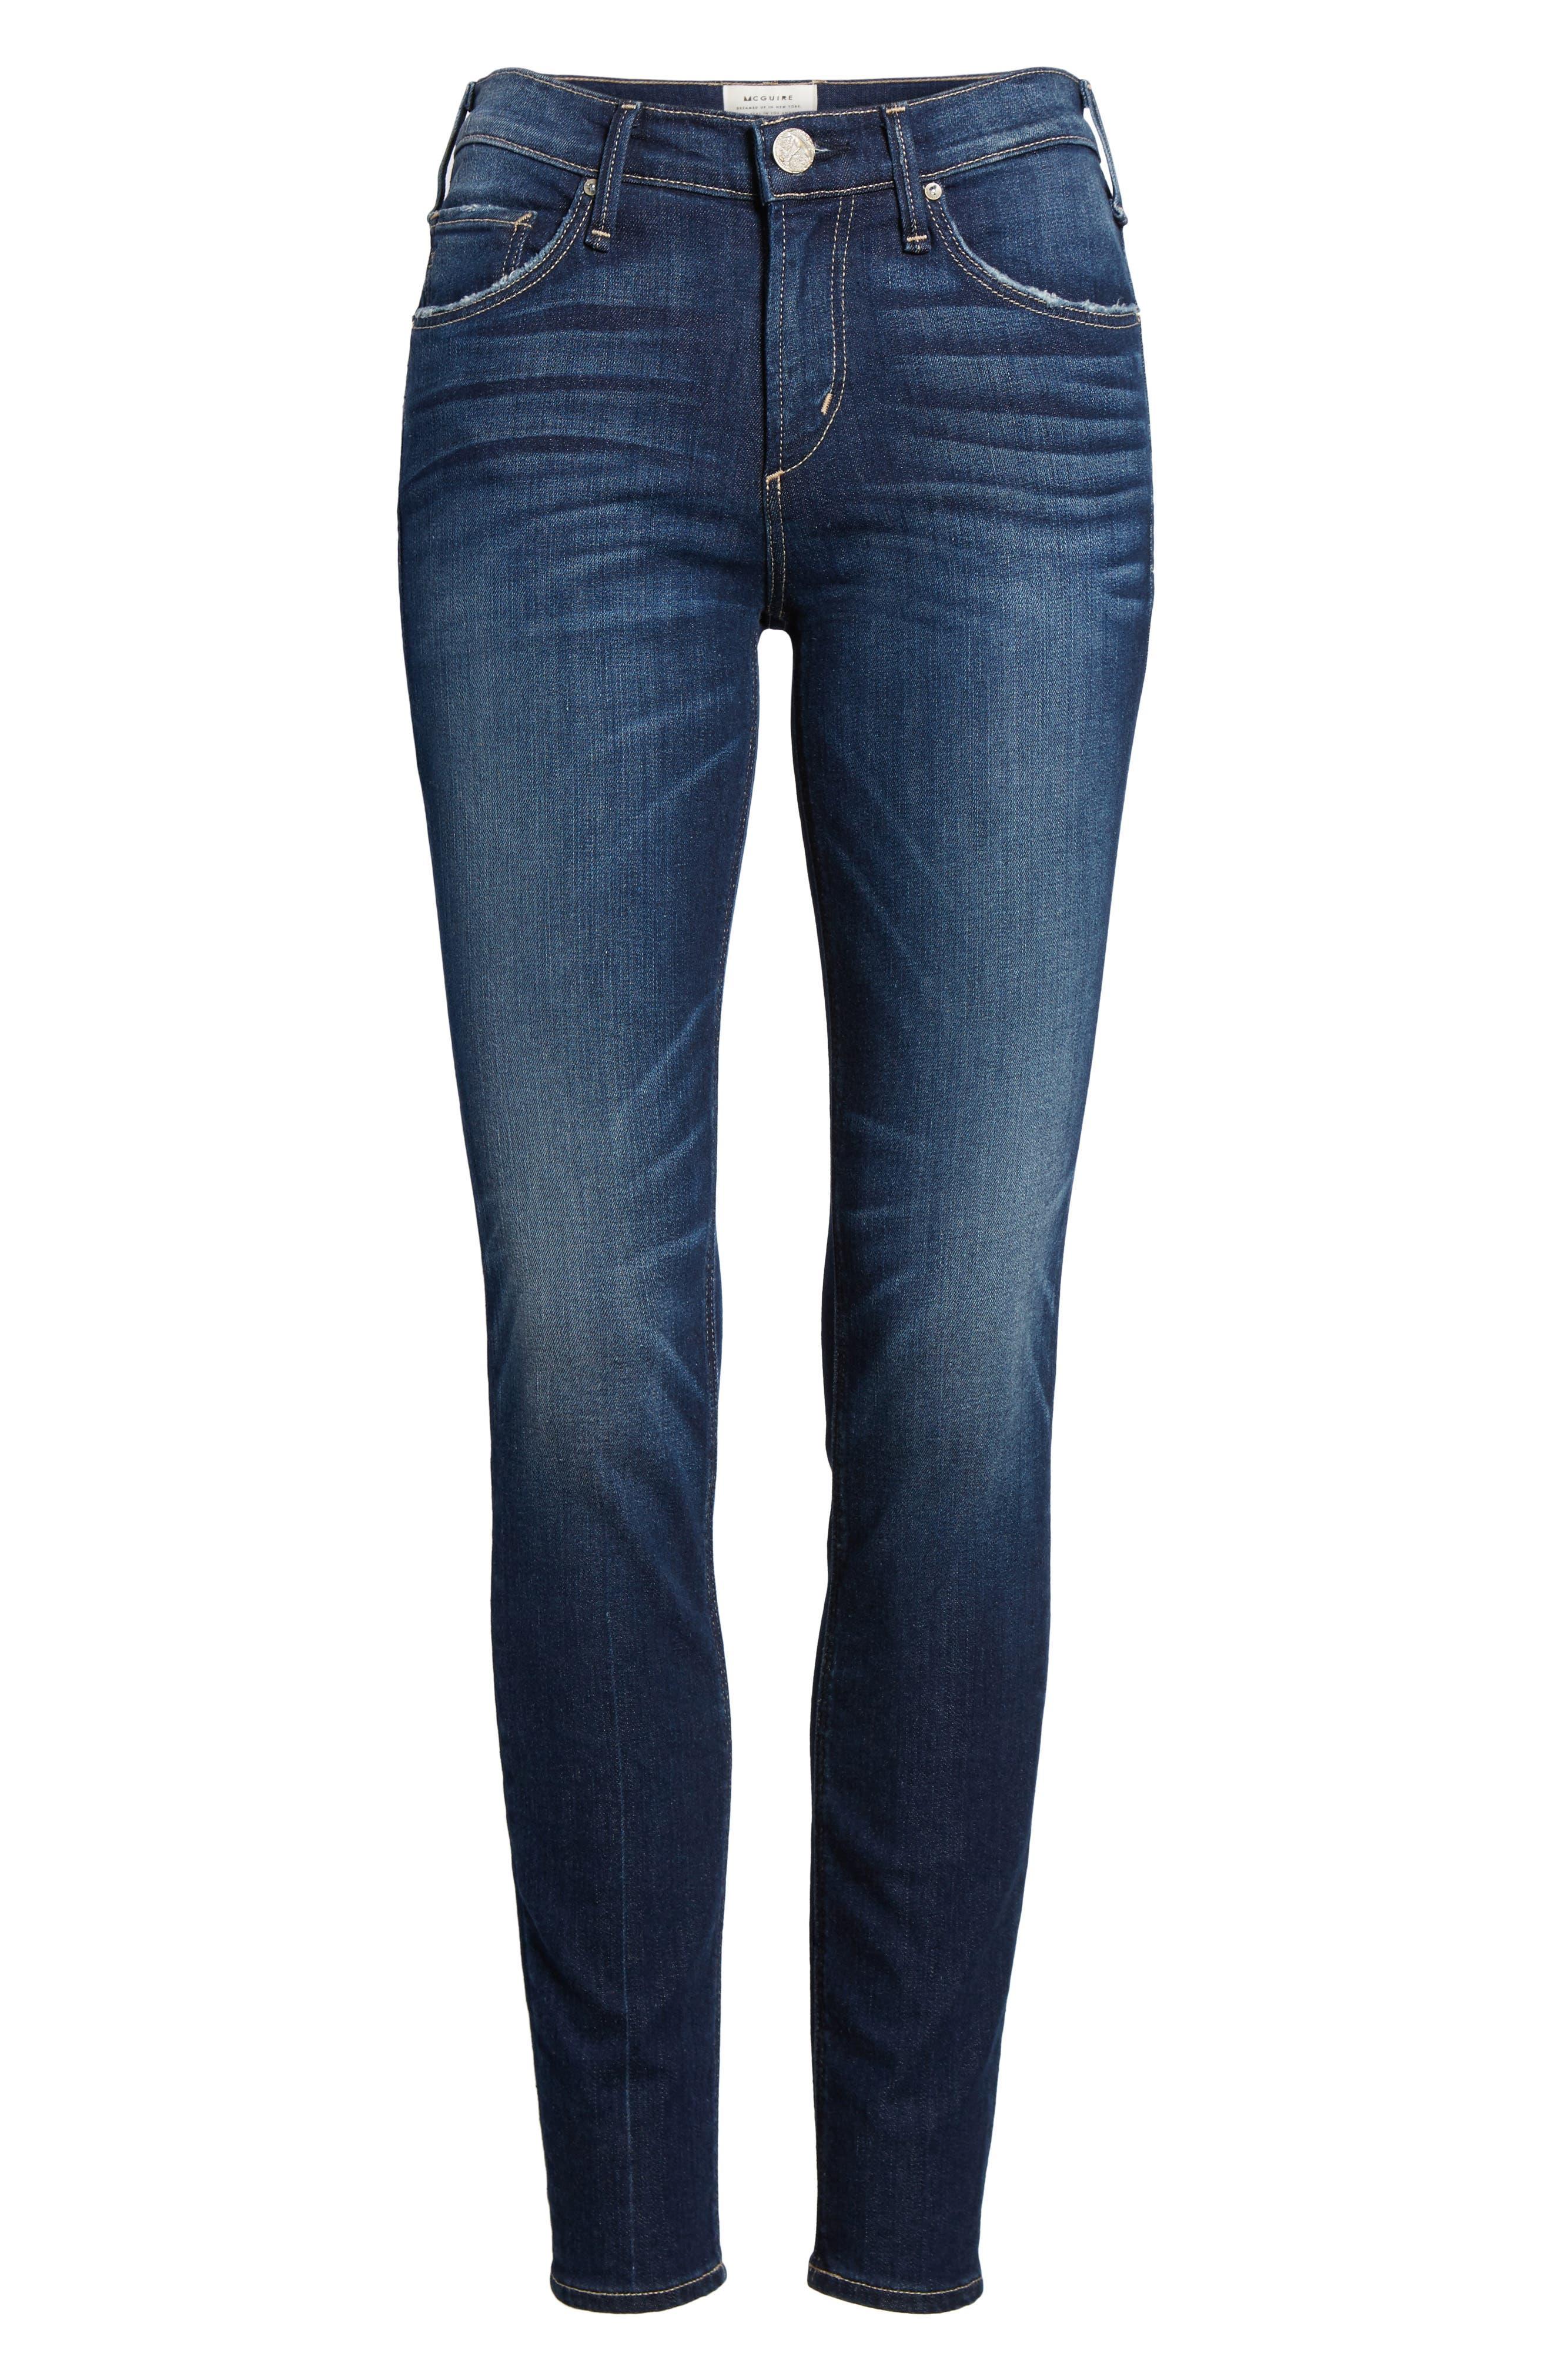 Newton Skinny Jeans,                             Alternate thumbnail 7, color,                             429